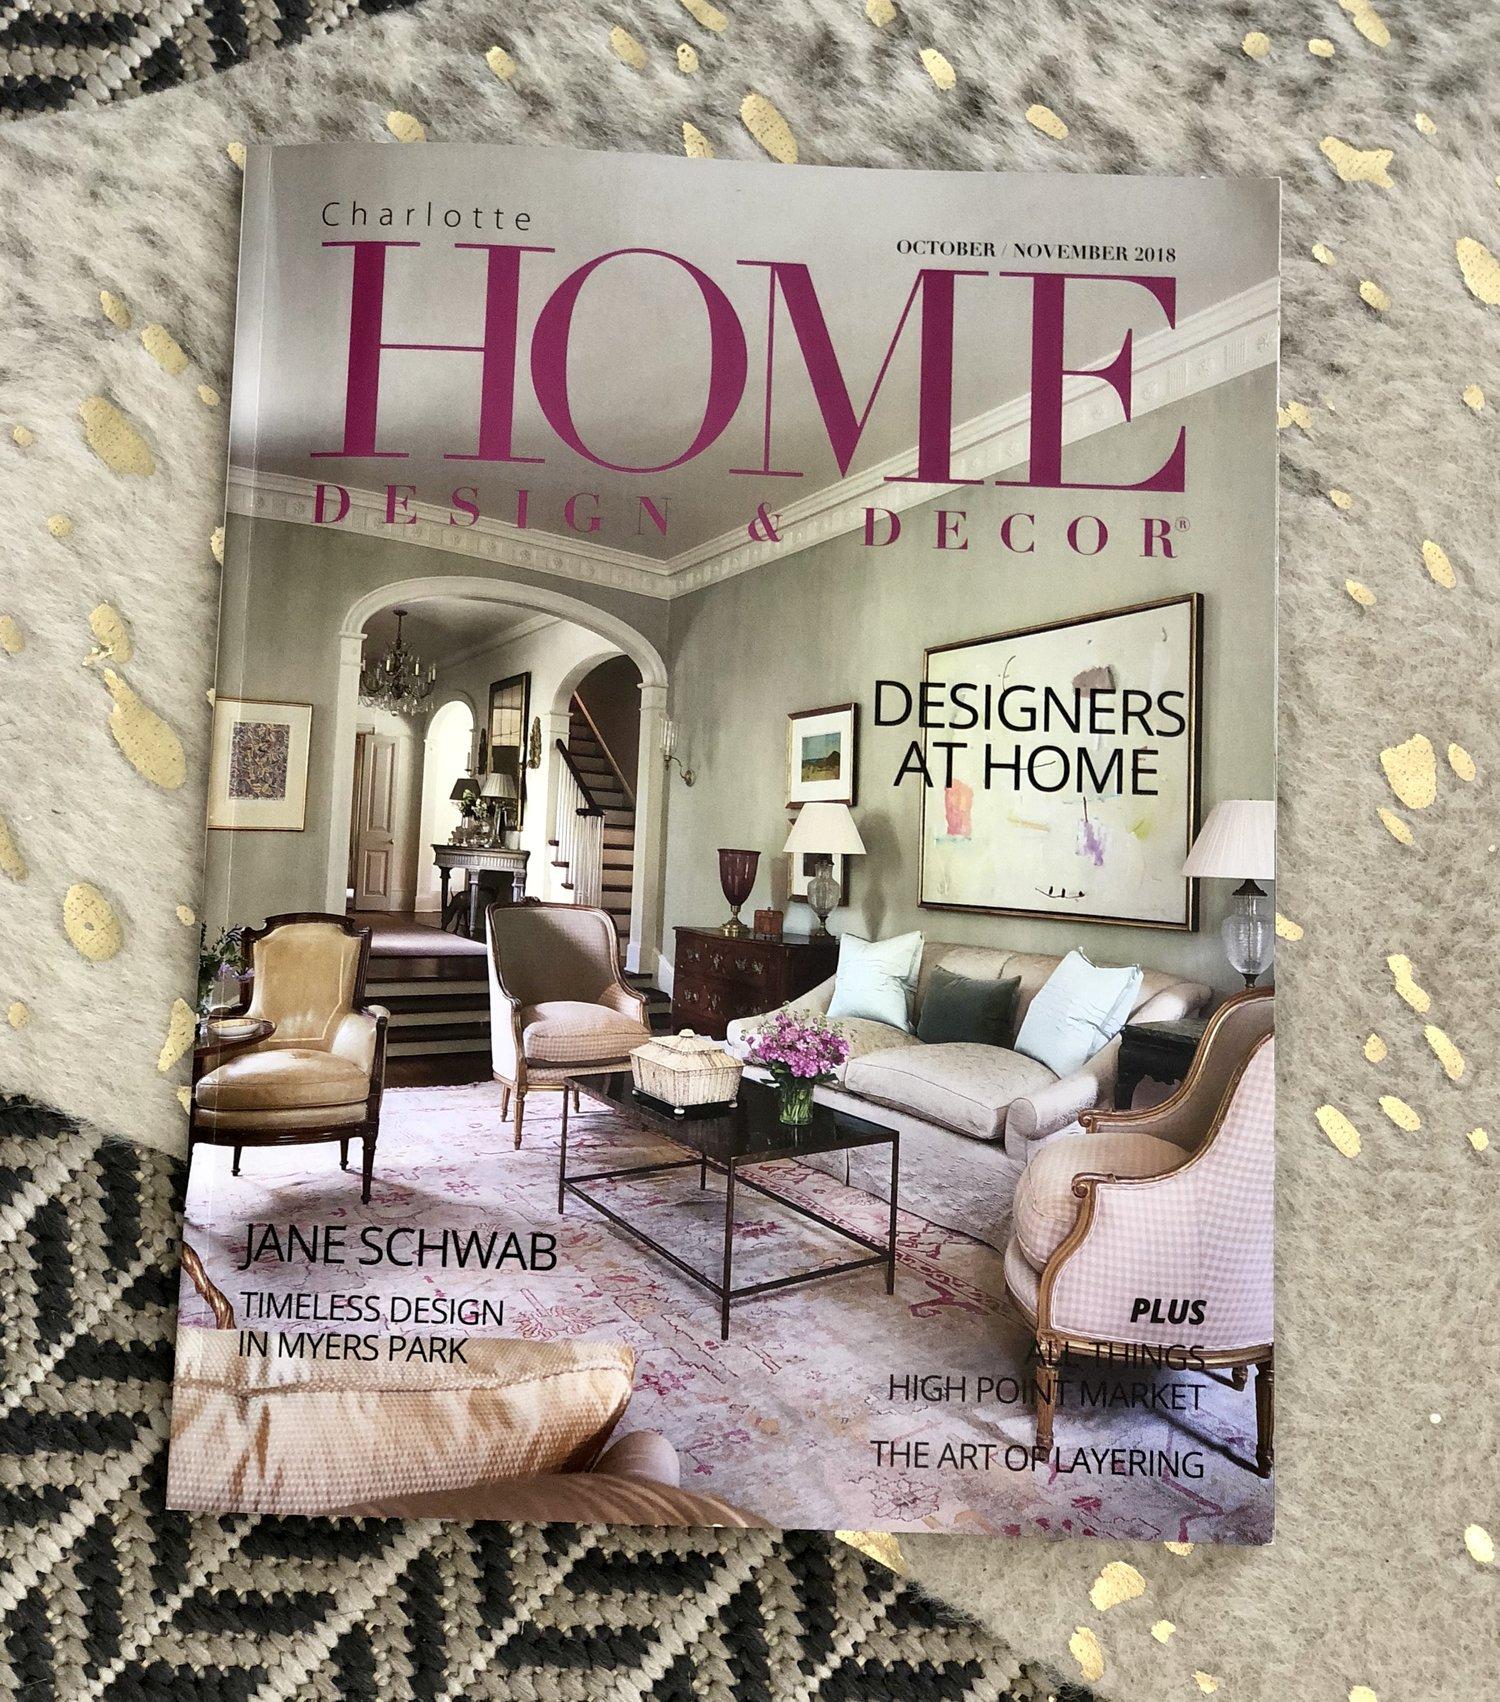 Home Design Et Deco charlotte home design & decor: to market — stilo